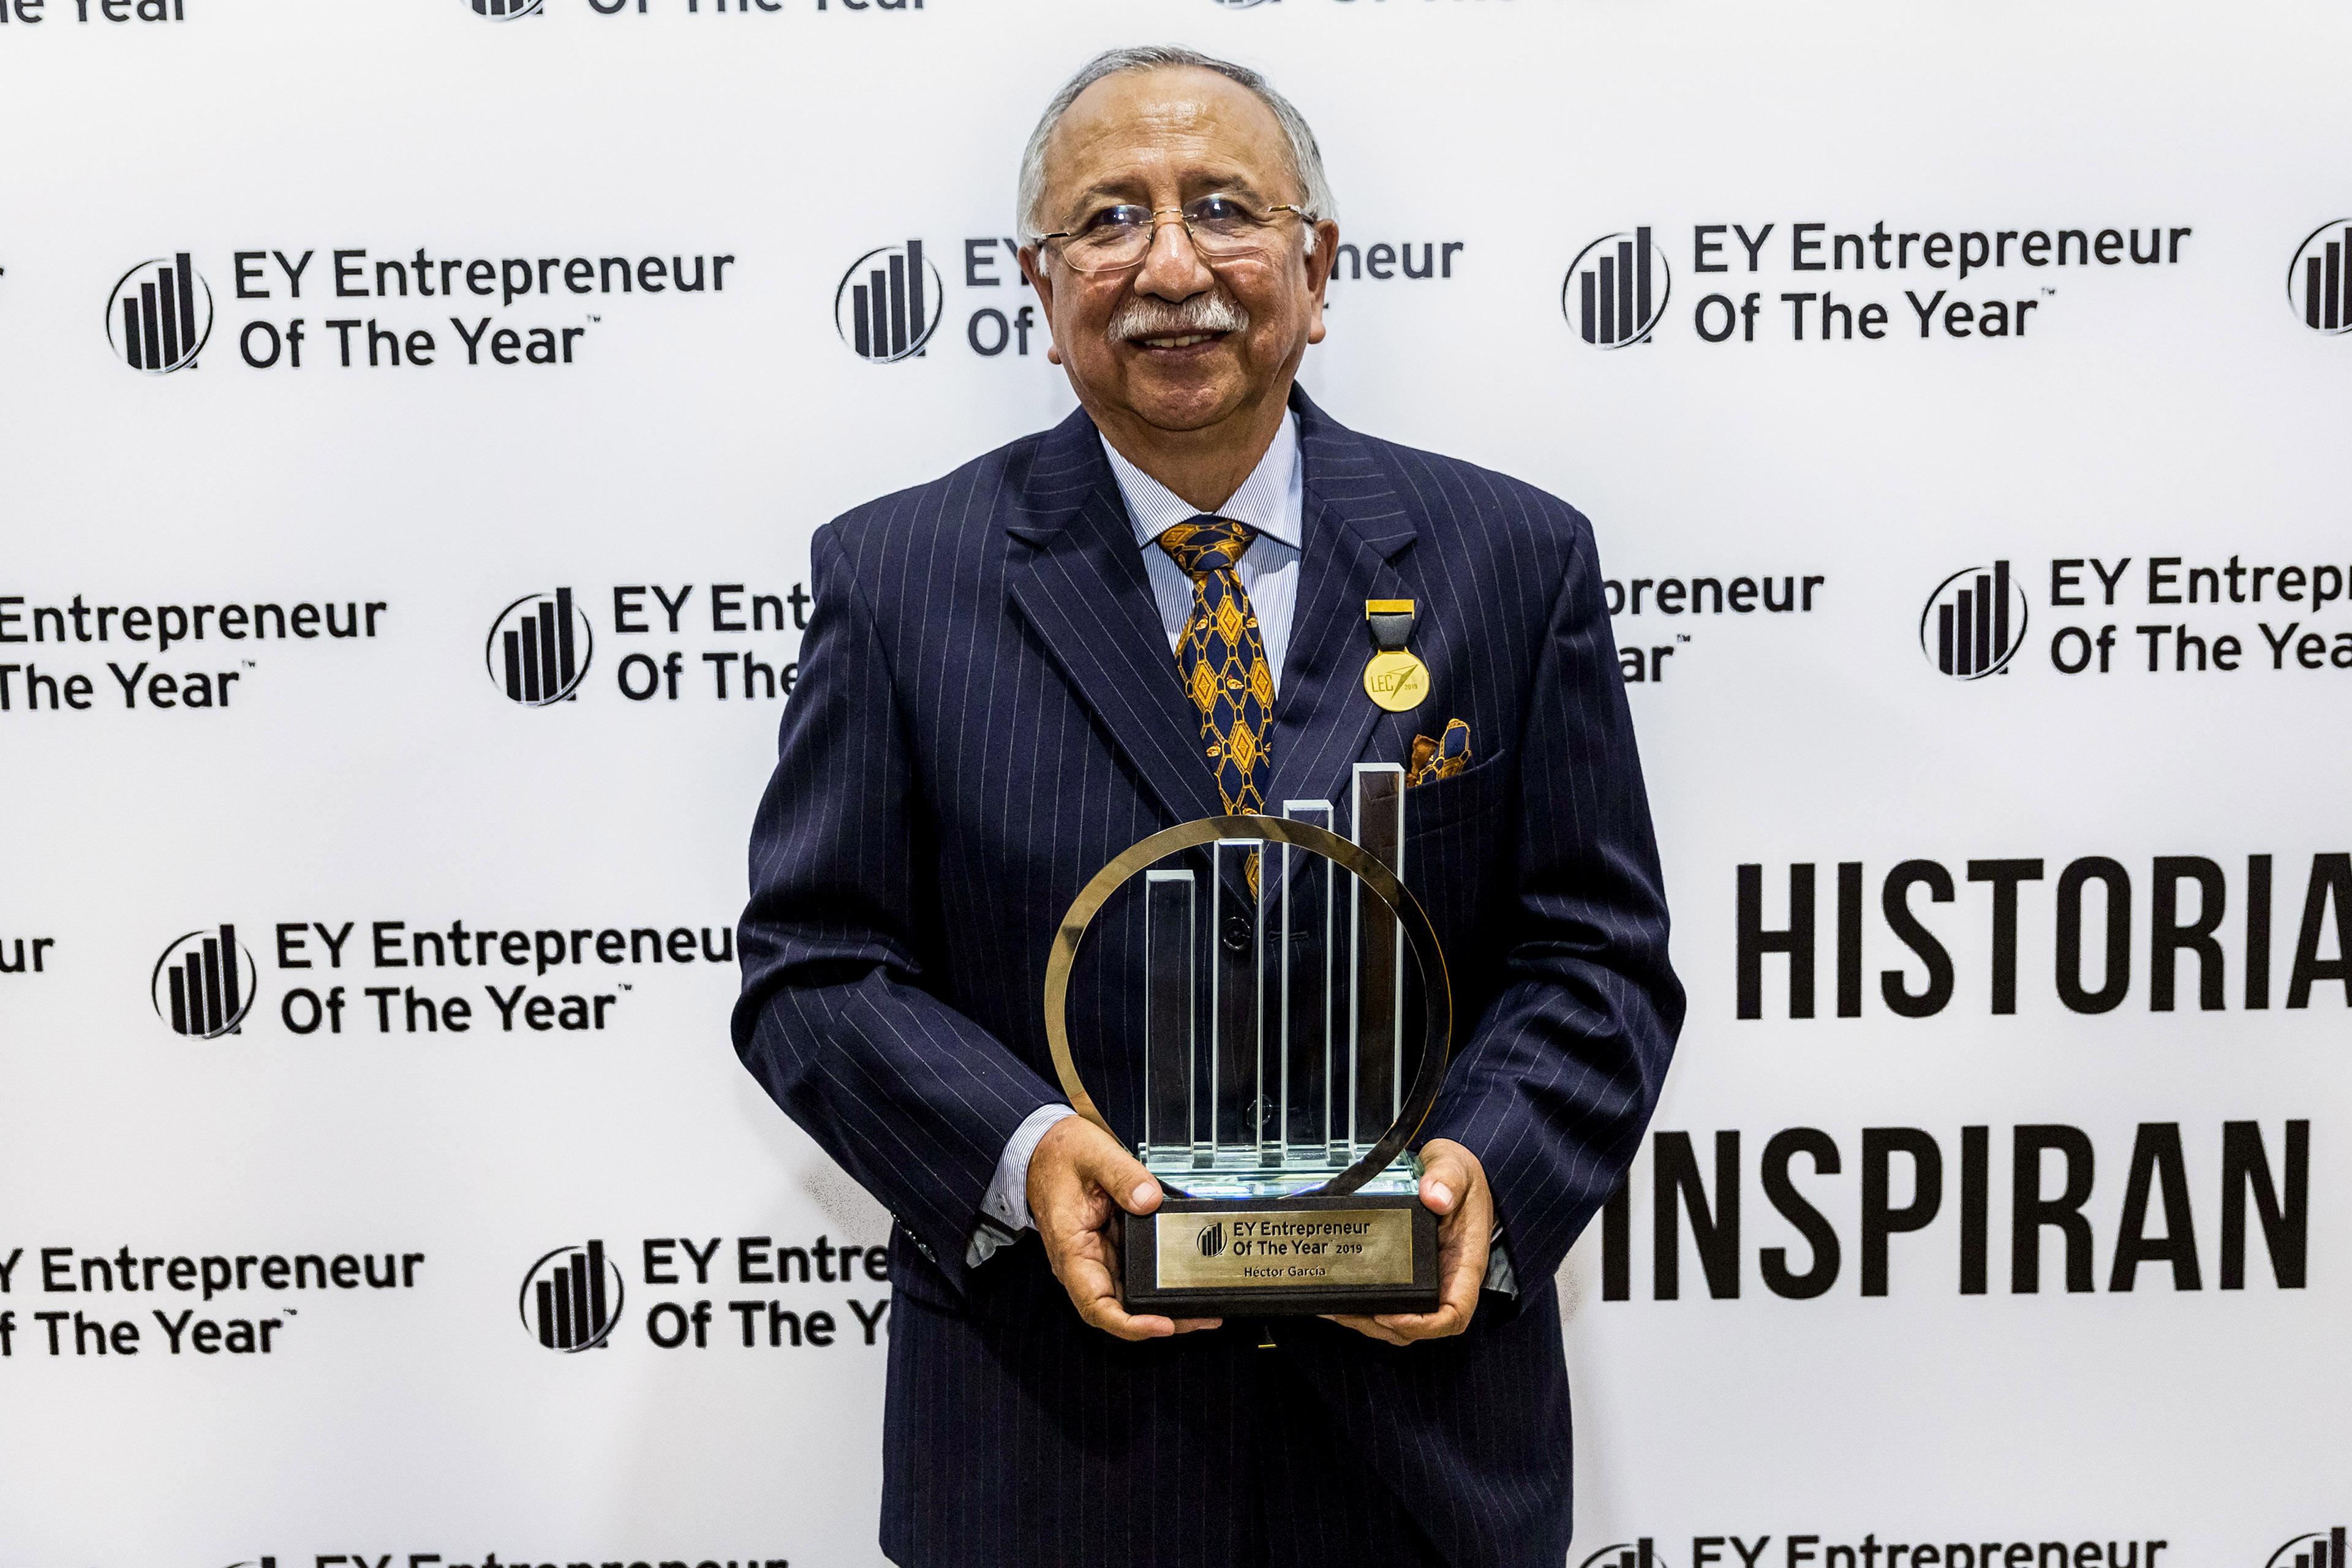 2019 Entrepreneur Héctor García Béjar